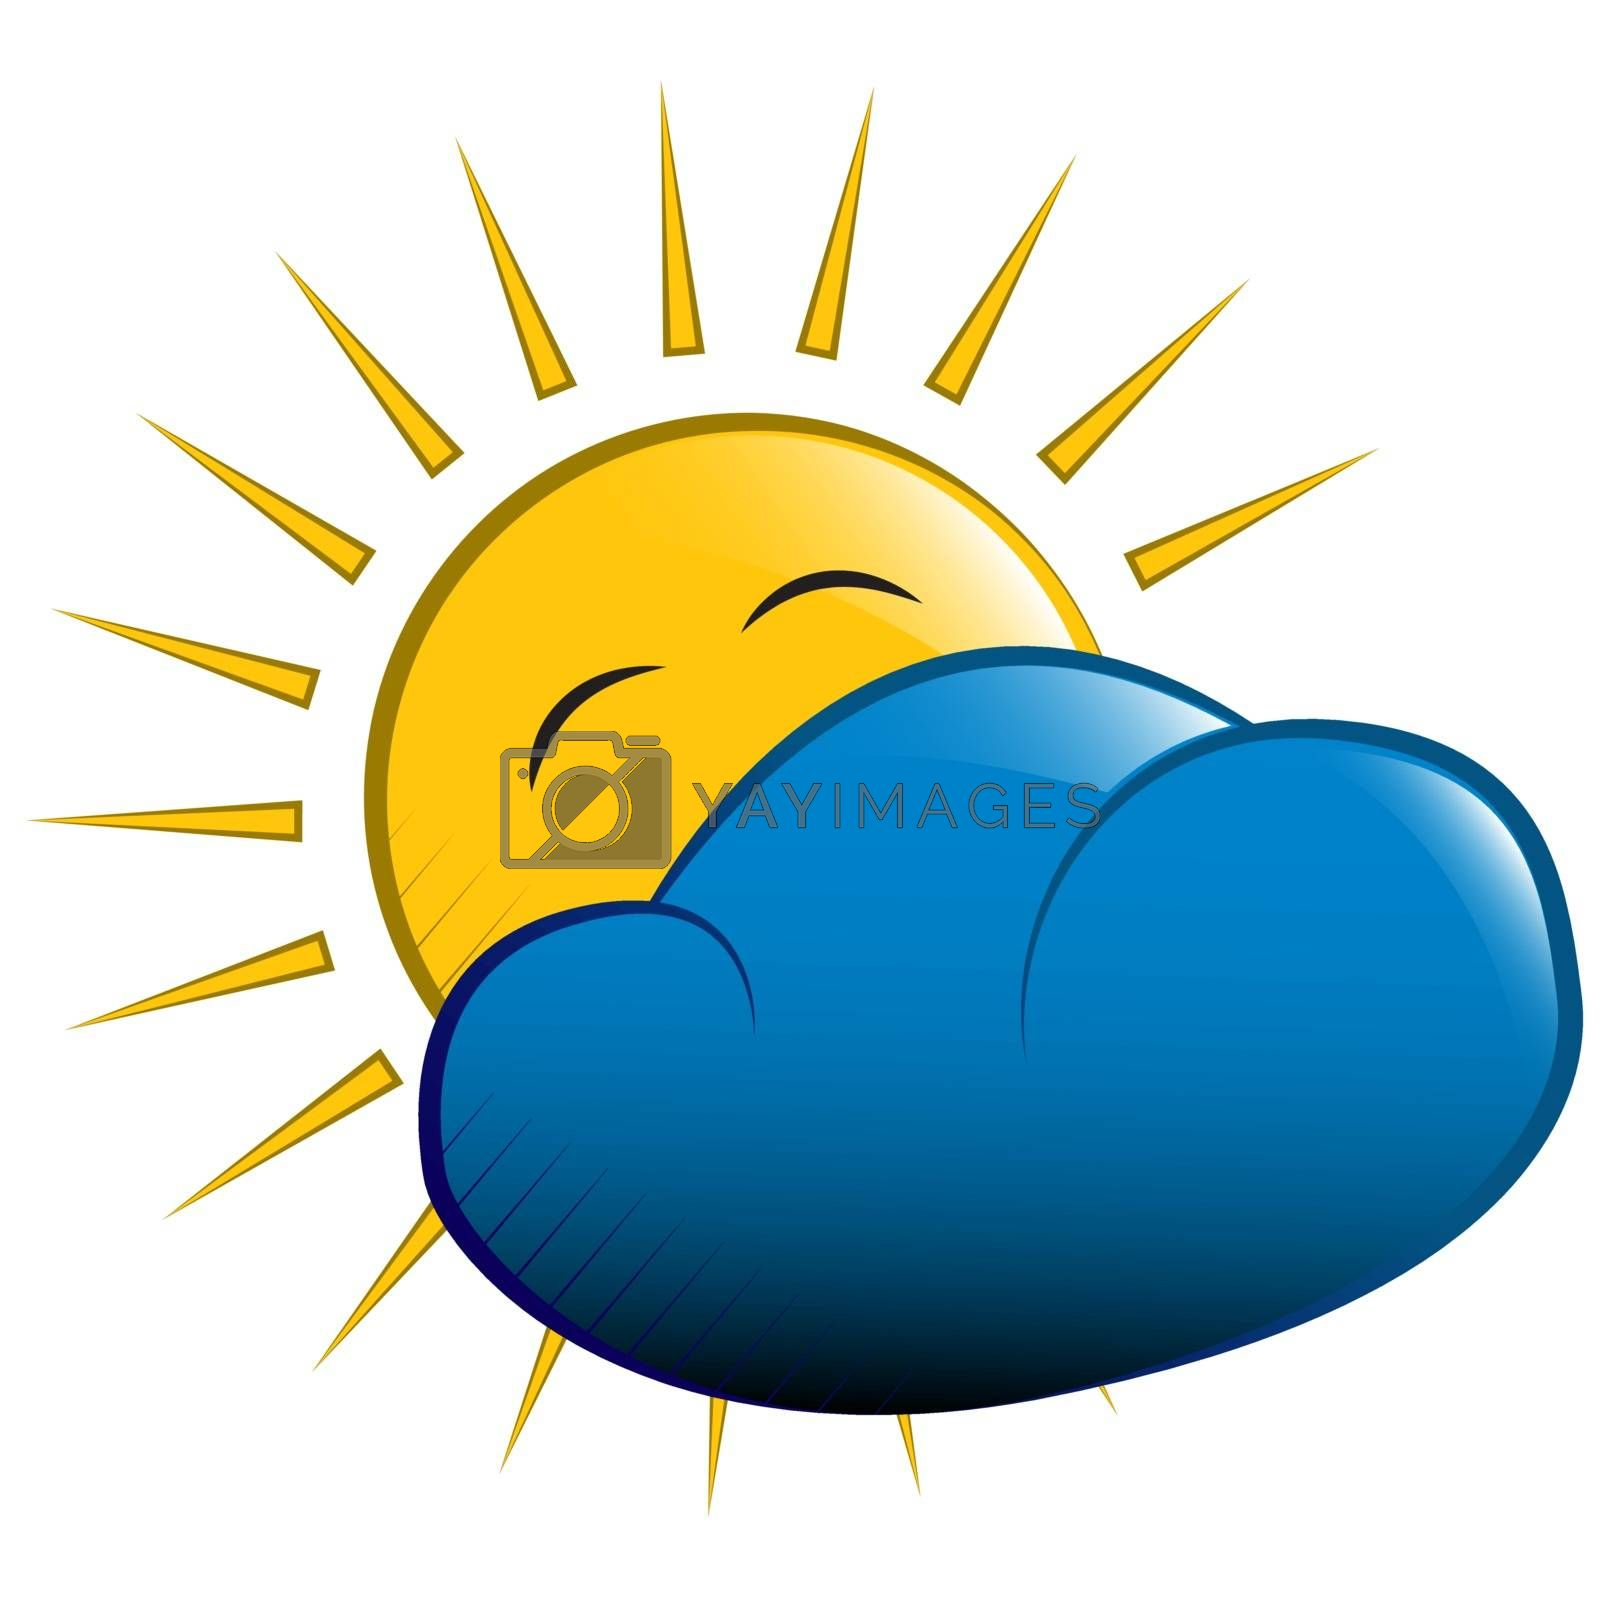 vector illustration. yellow sun behind a cloud